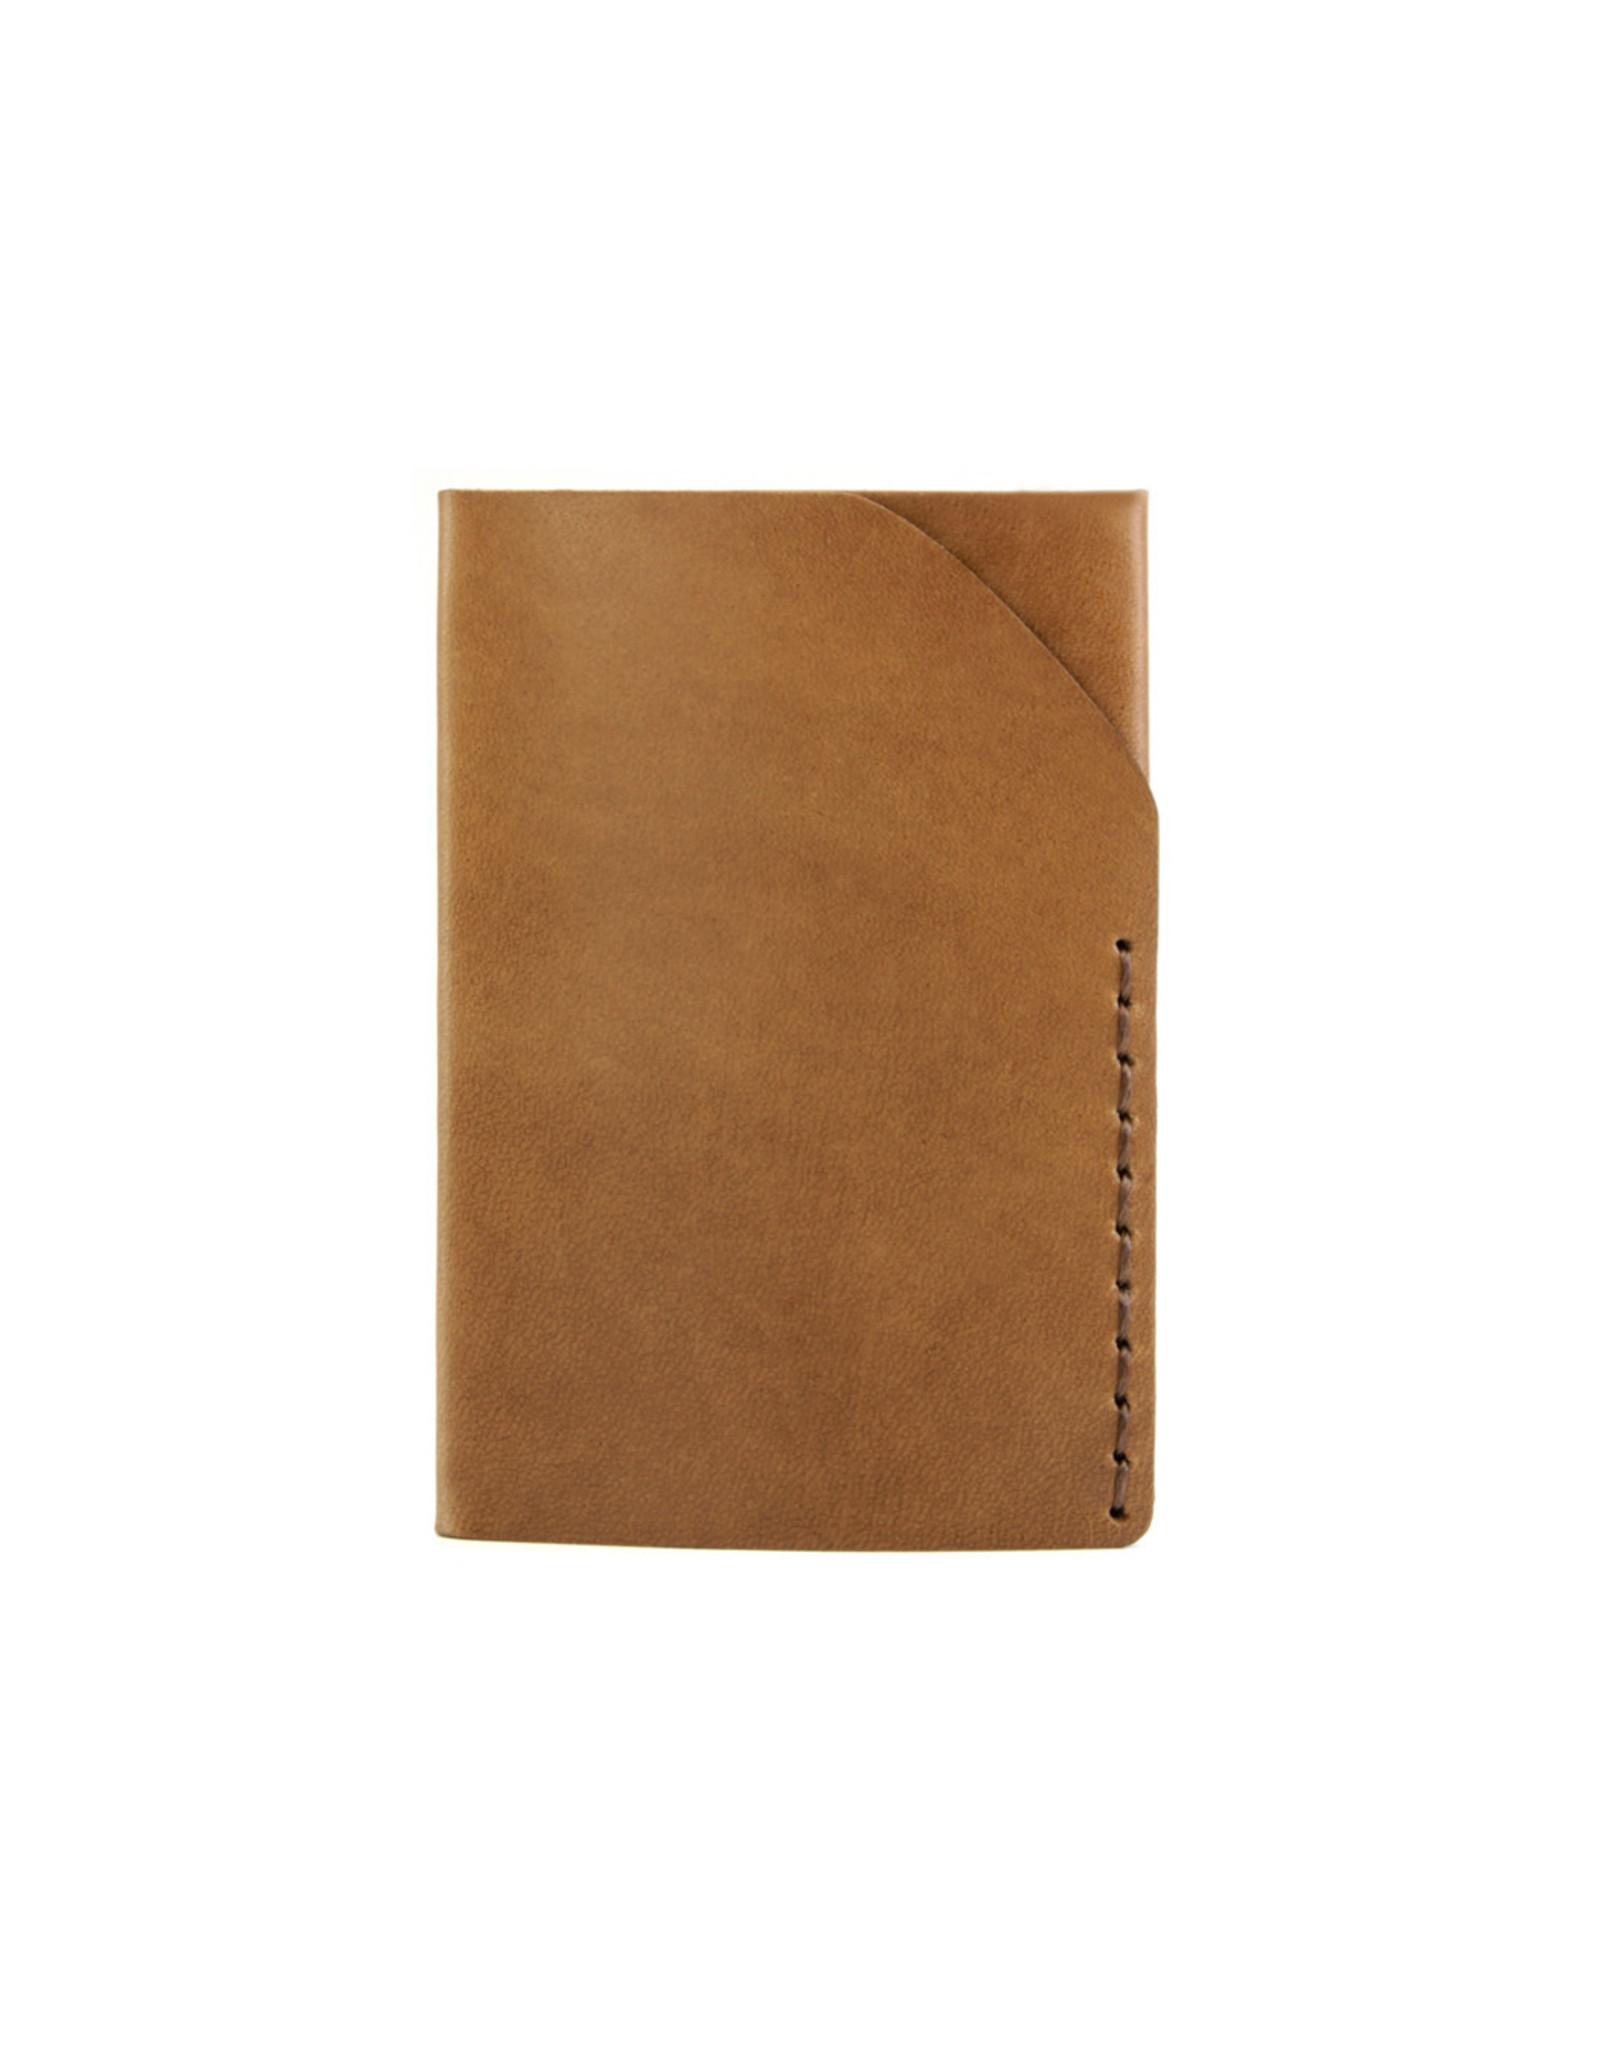 Ezra Arthur No. 2 Wallet